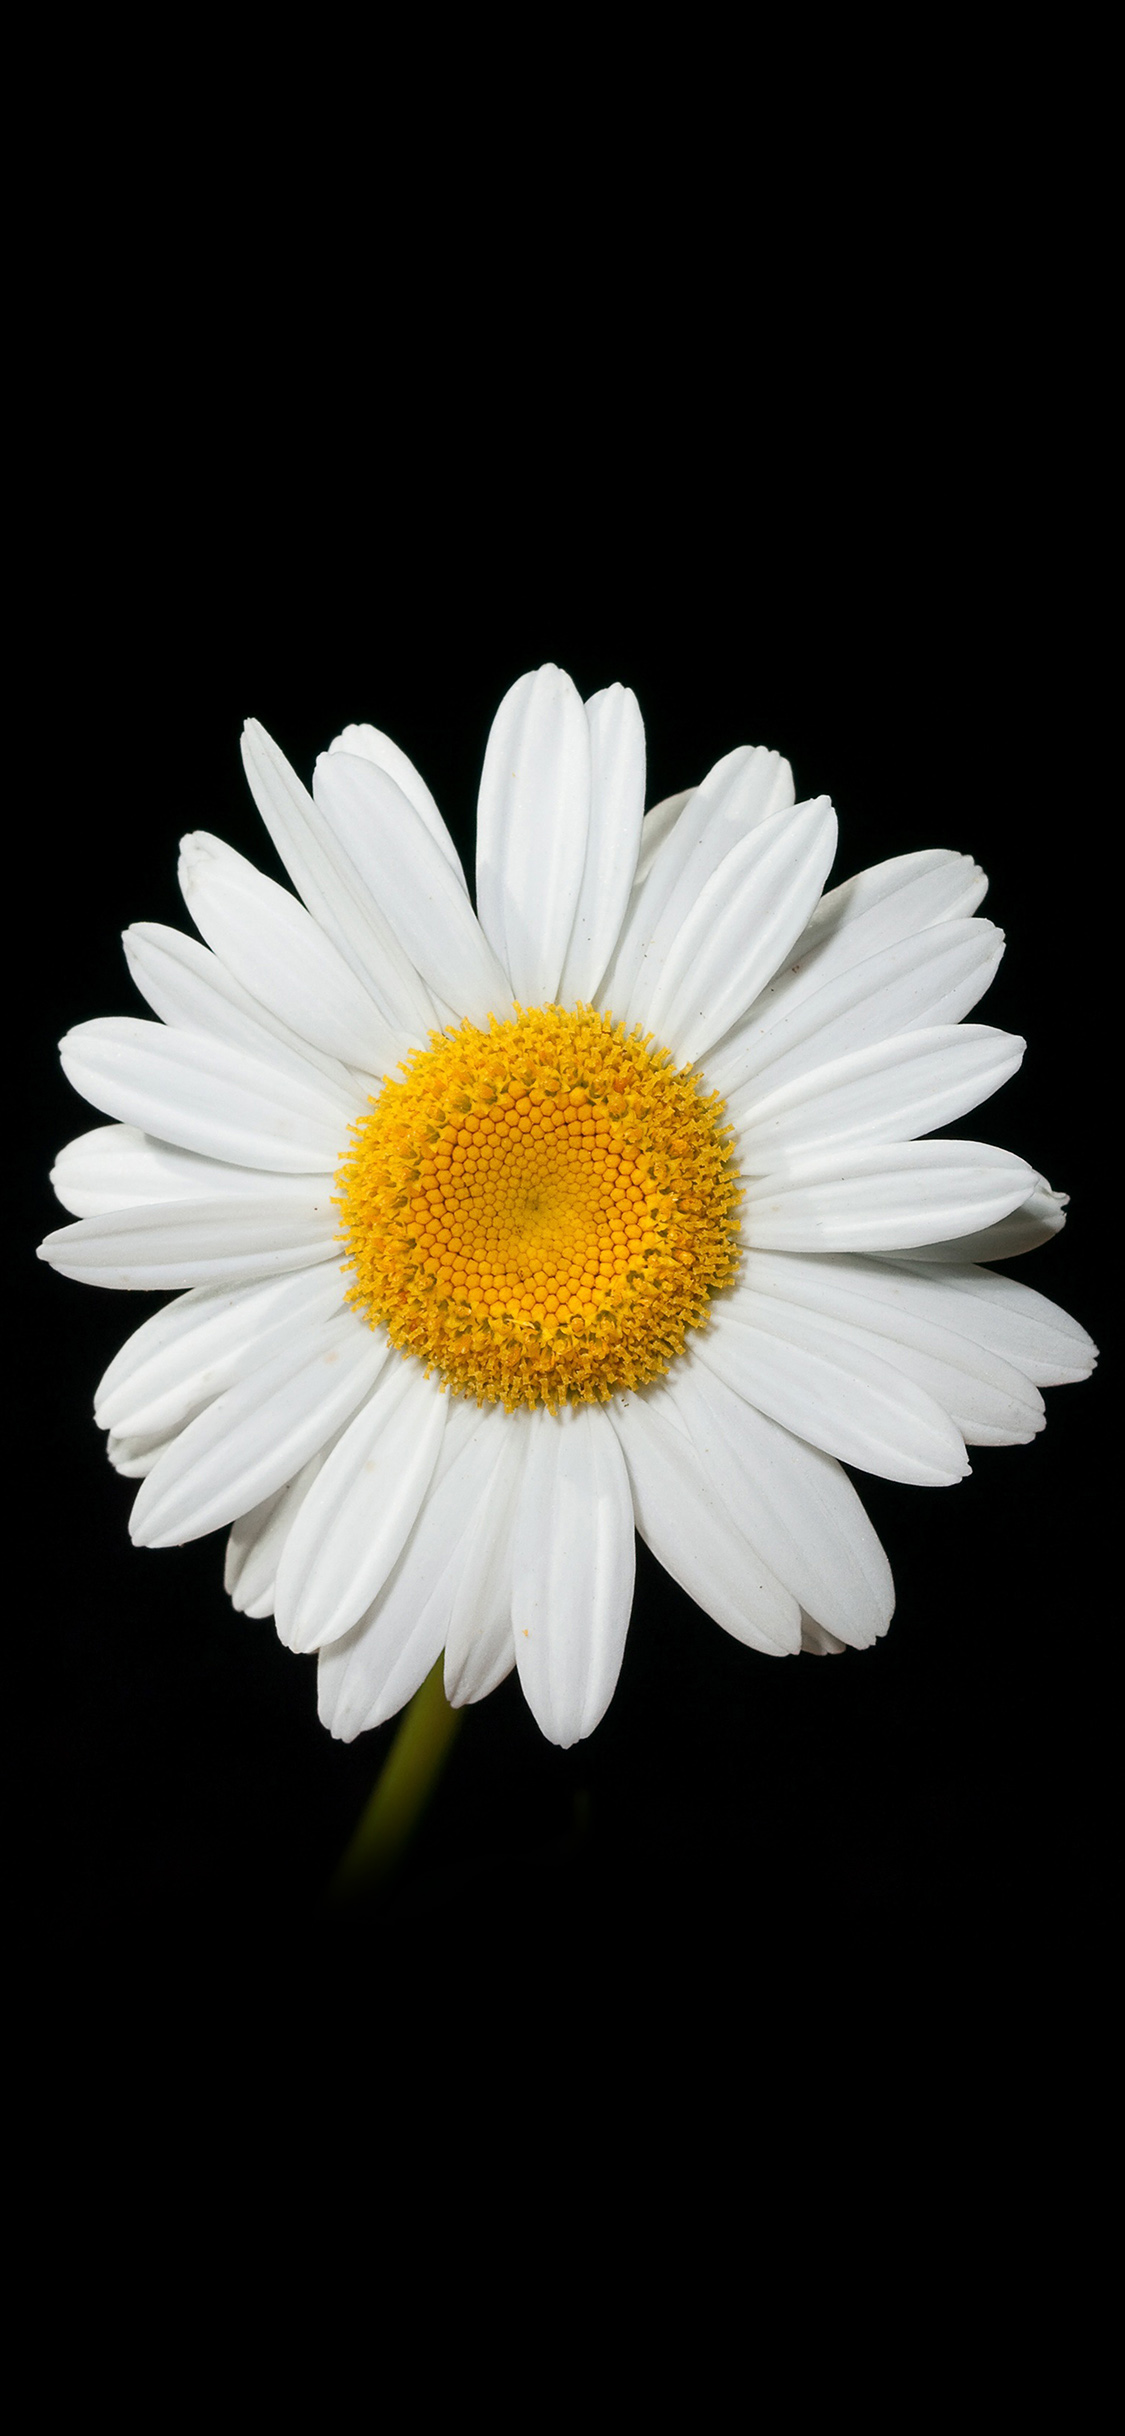 iphonexpapers | iphone x wallpaper | nc79-daisy-flower-dark-nature